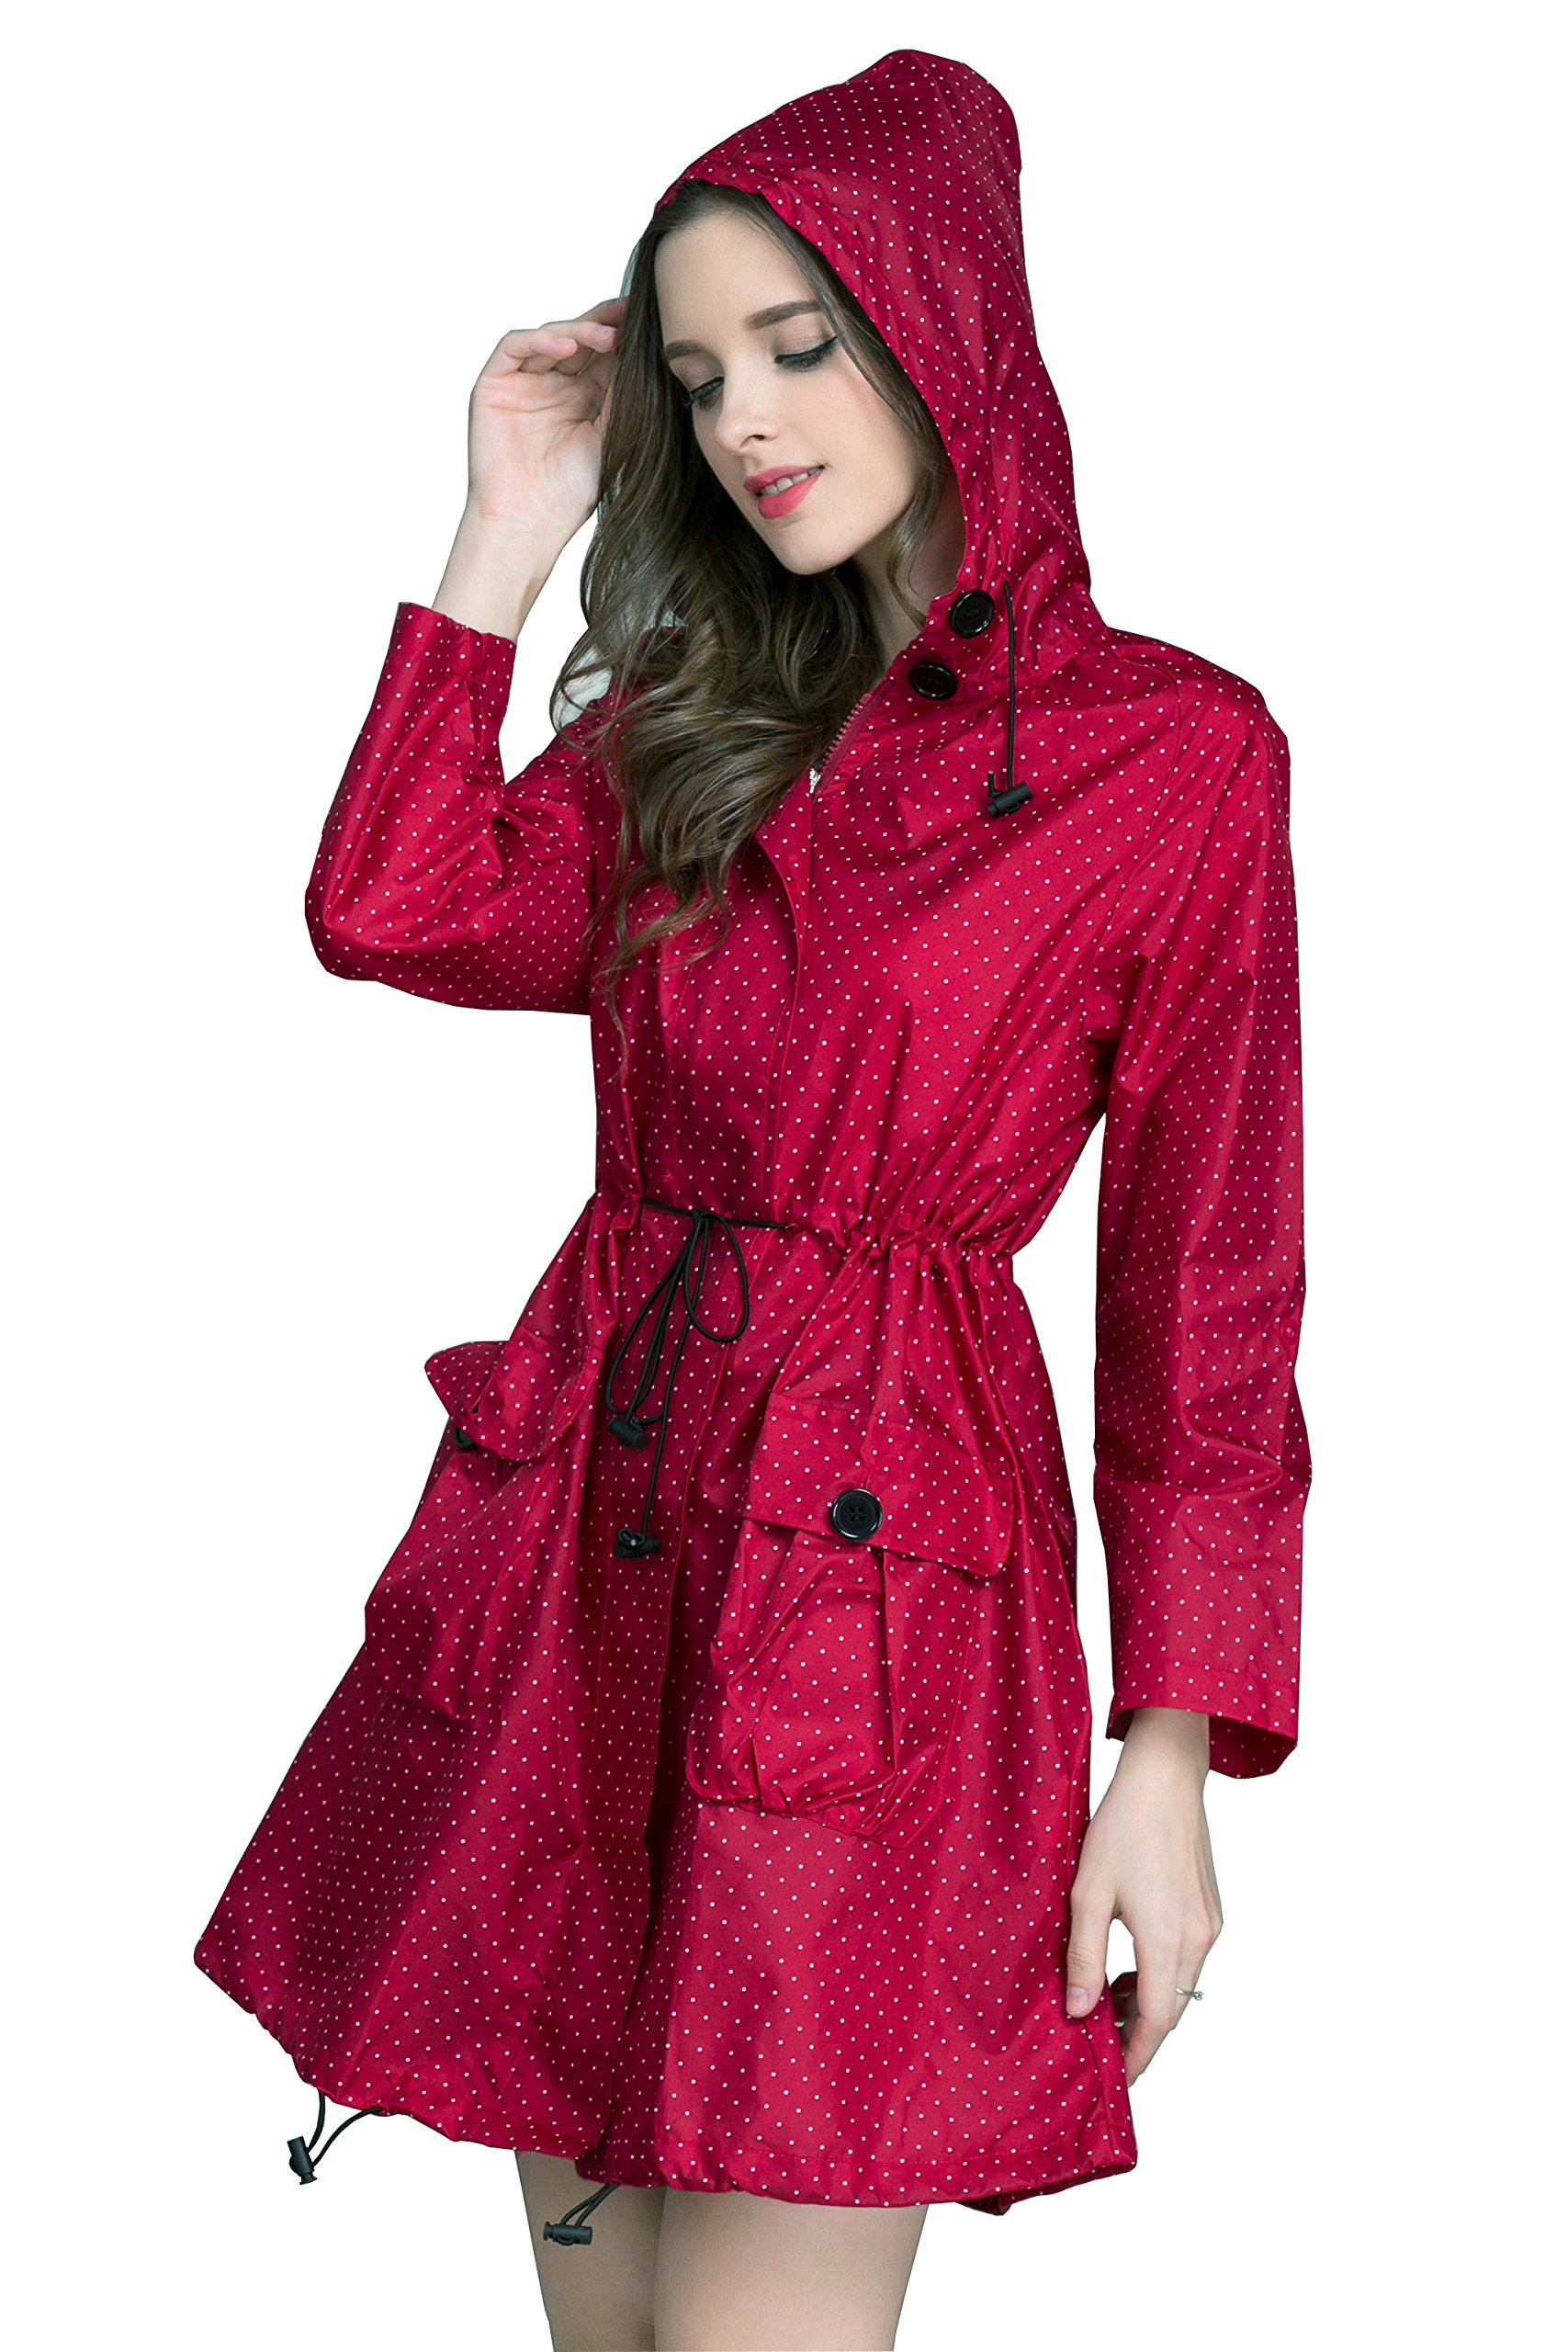 Aeman Women's Raincoat Waterproof Portable Outdoor Dot Rain Jacket Poncho with Hood and Zip (Red-1)